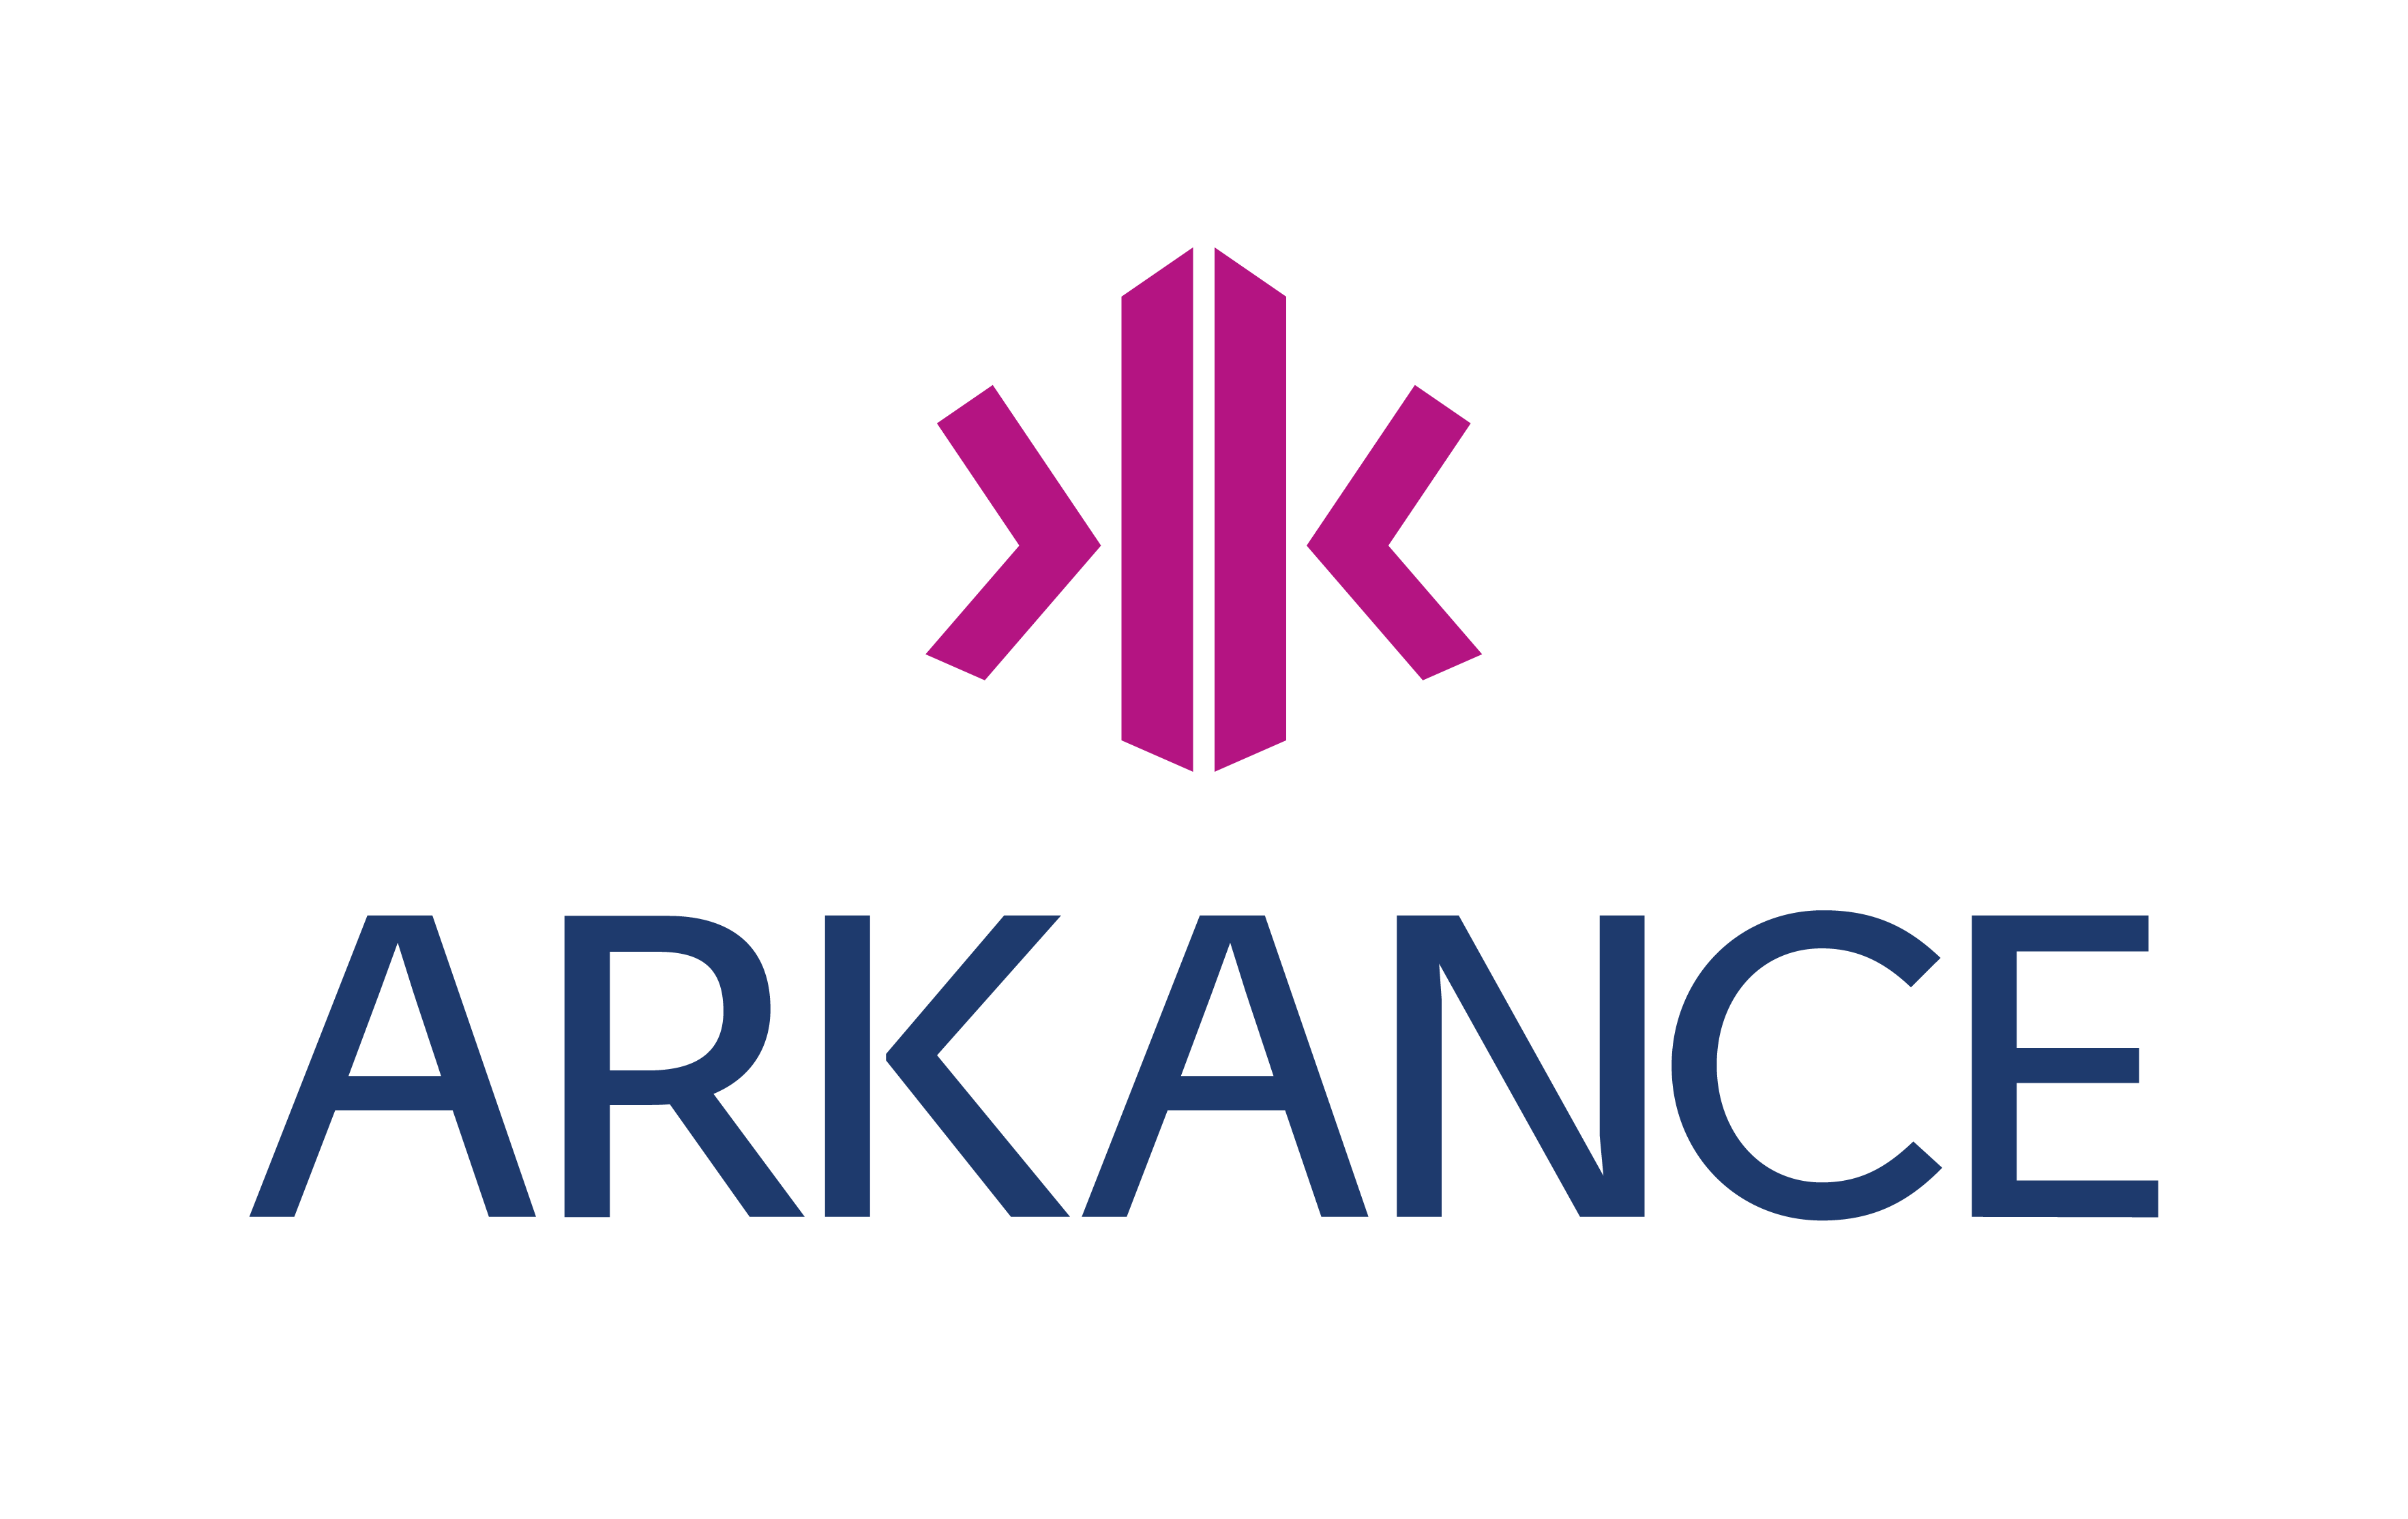 arkance_groupe_v_rvb_300dpi.png